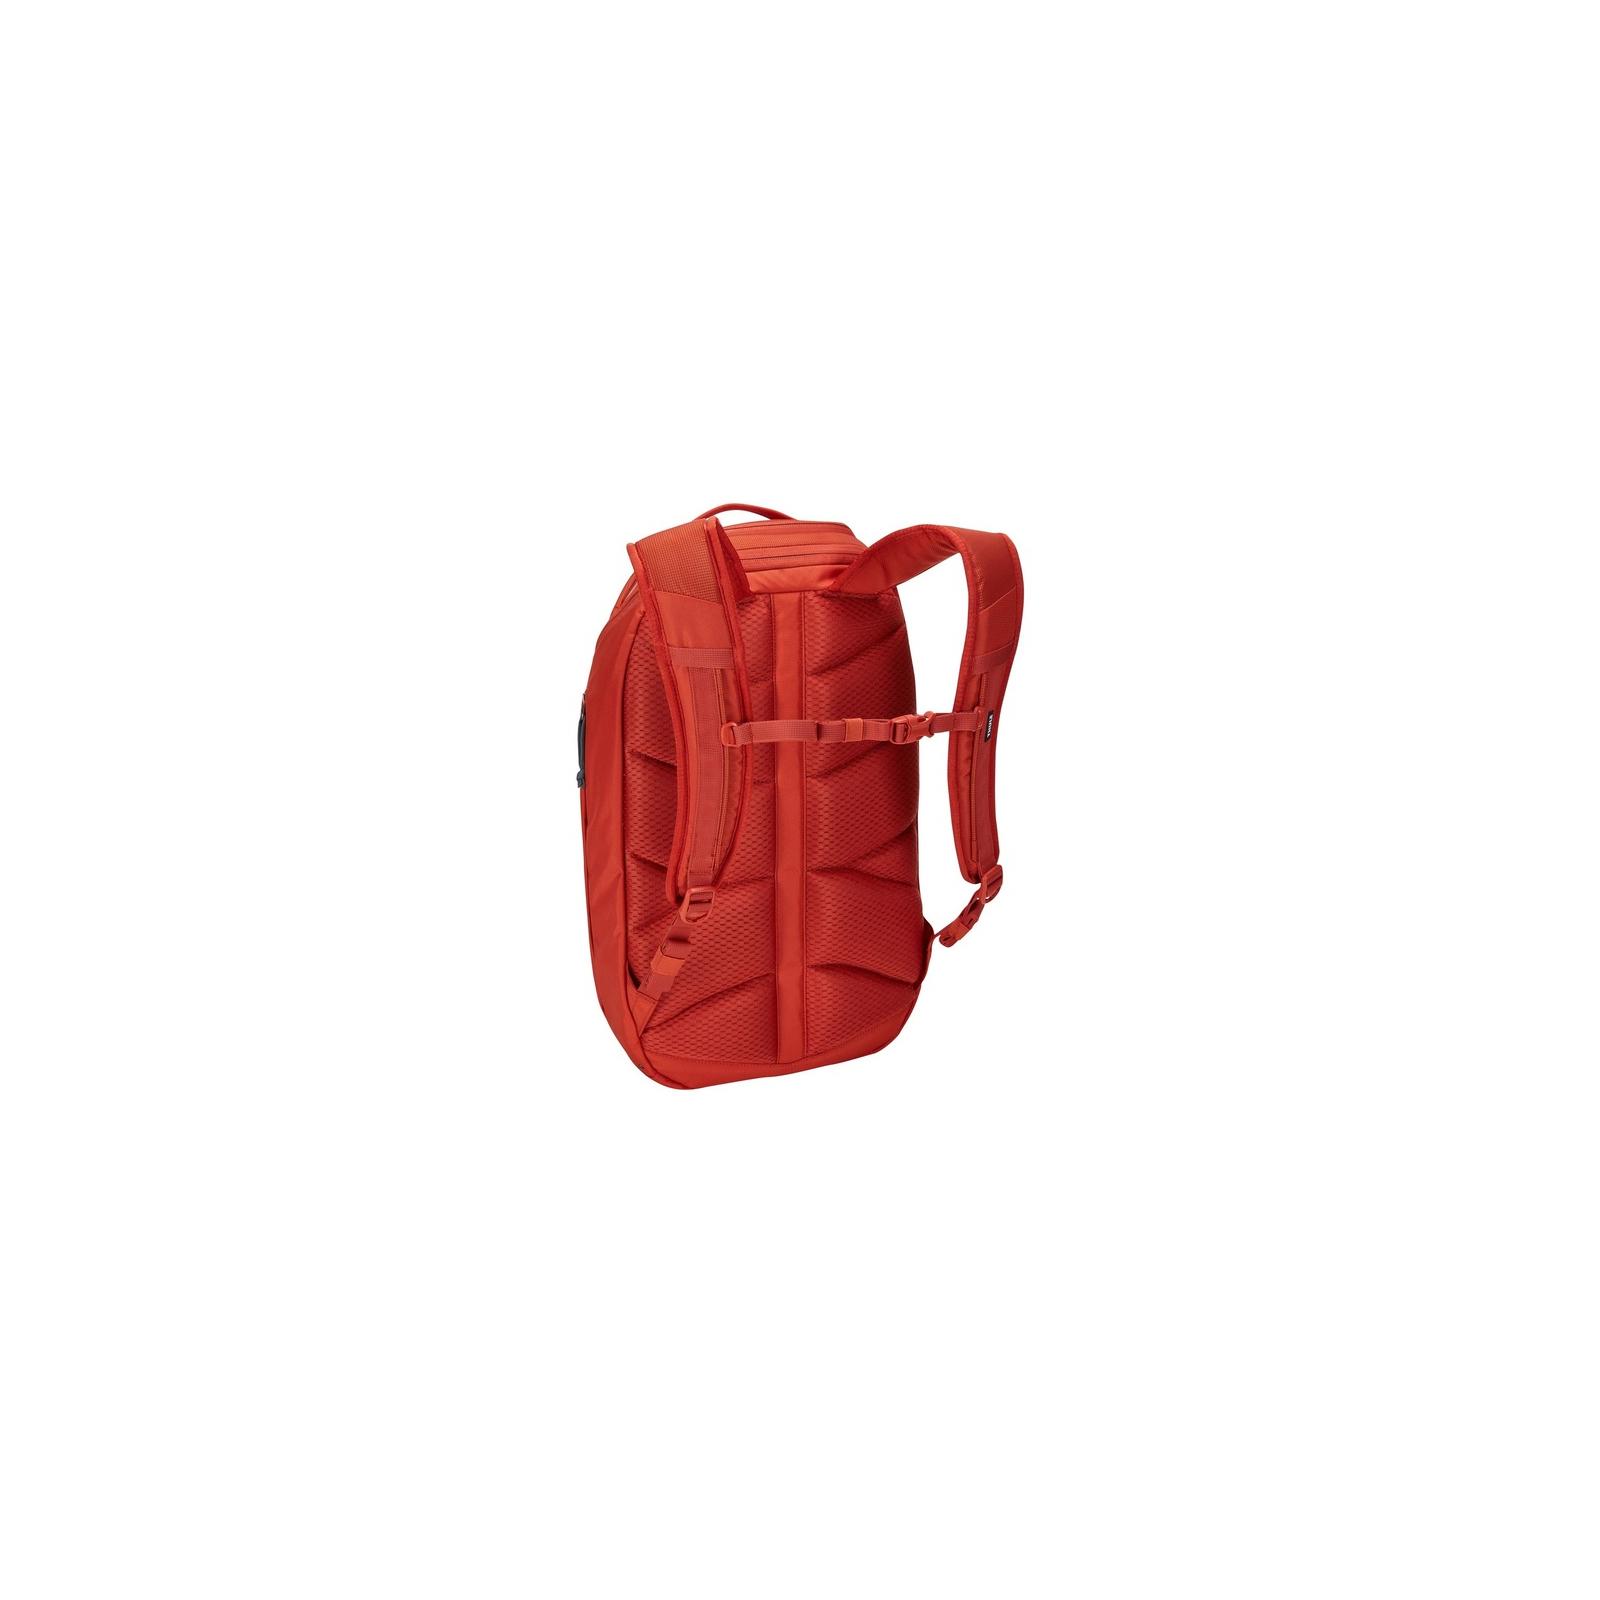 "Рюкзак для ноутбука Thule 15.6"" EnRoute 23L TEBP-316 Asphalt (3203830) изображение 2"